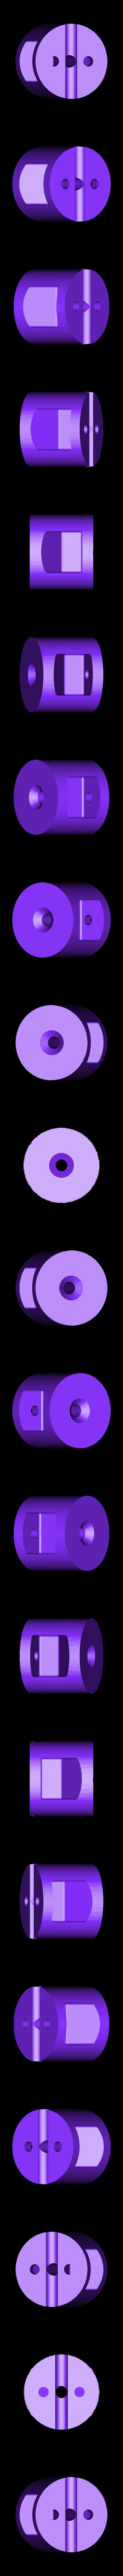 extension.stl Download free STL file Spacelamp • 3D printable object, Merioz3D